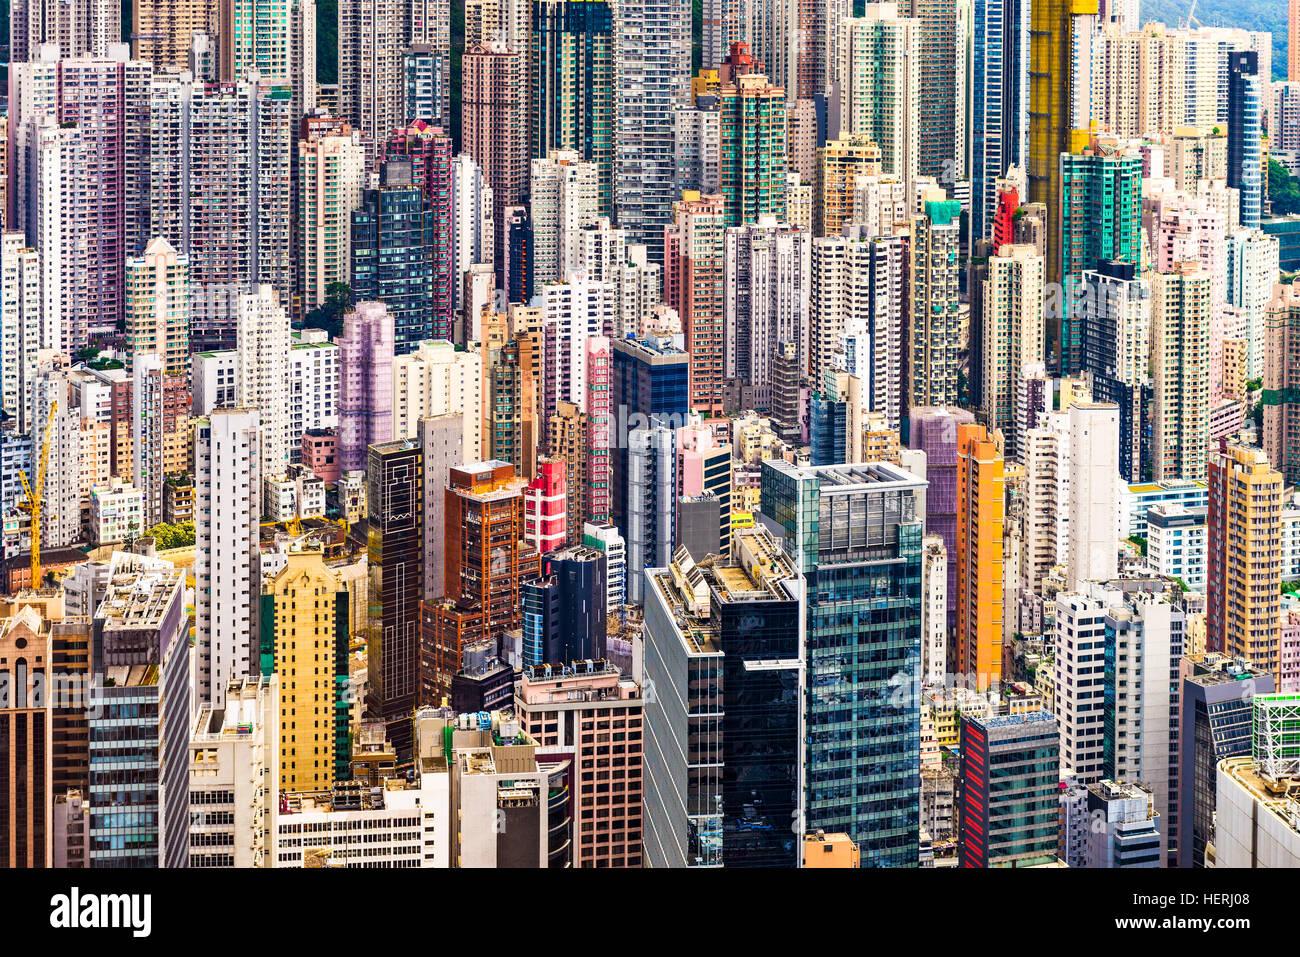 Hong Kong Cina densa di edifici urbani Immagini Stock